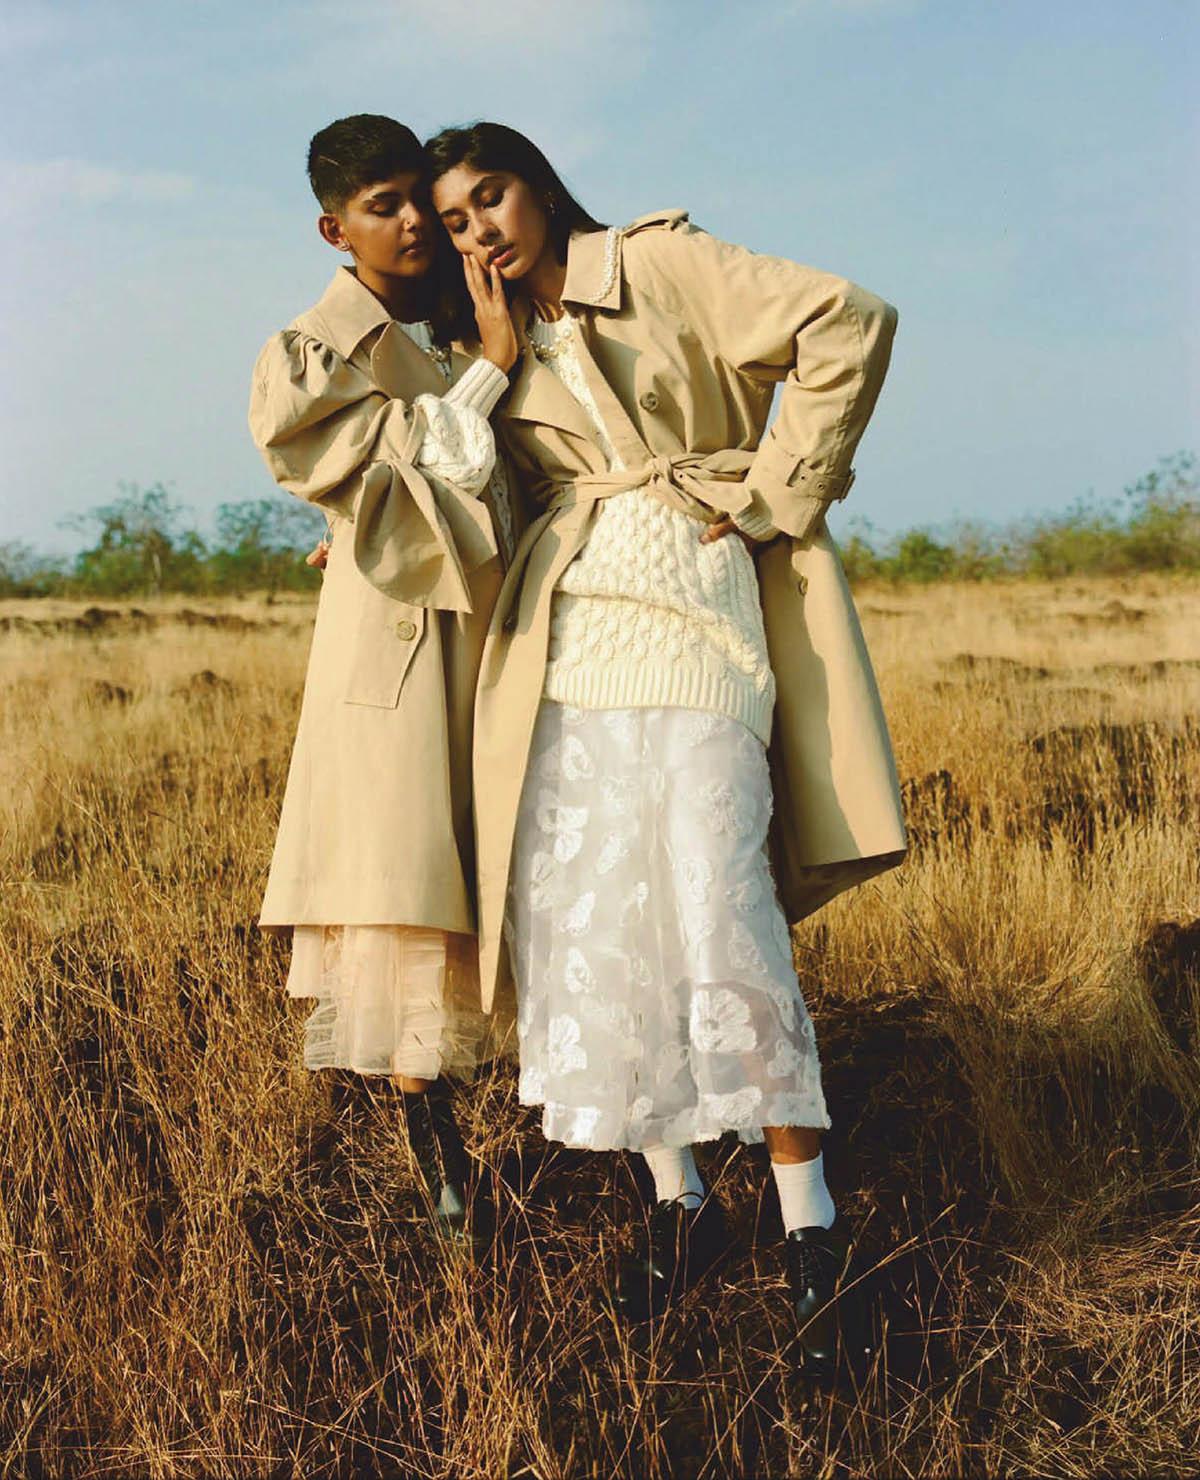 Haima Simoes and Shruti Venkatesh cover Vogue India February 2021 by Bikramjit Bose